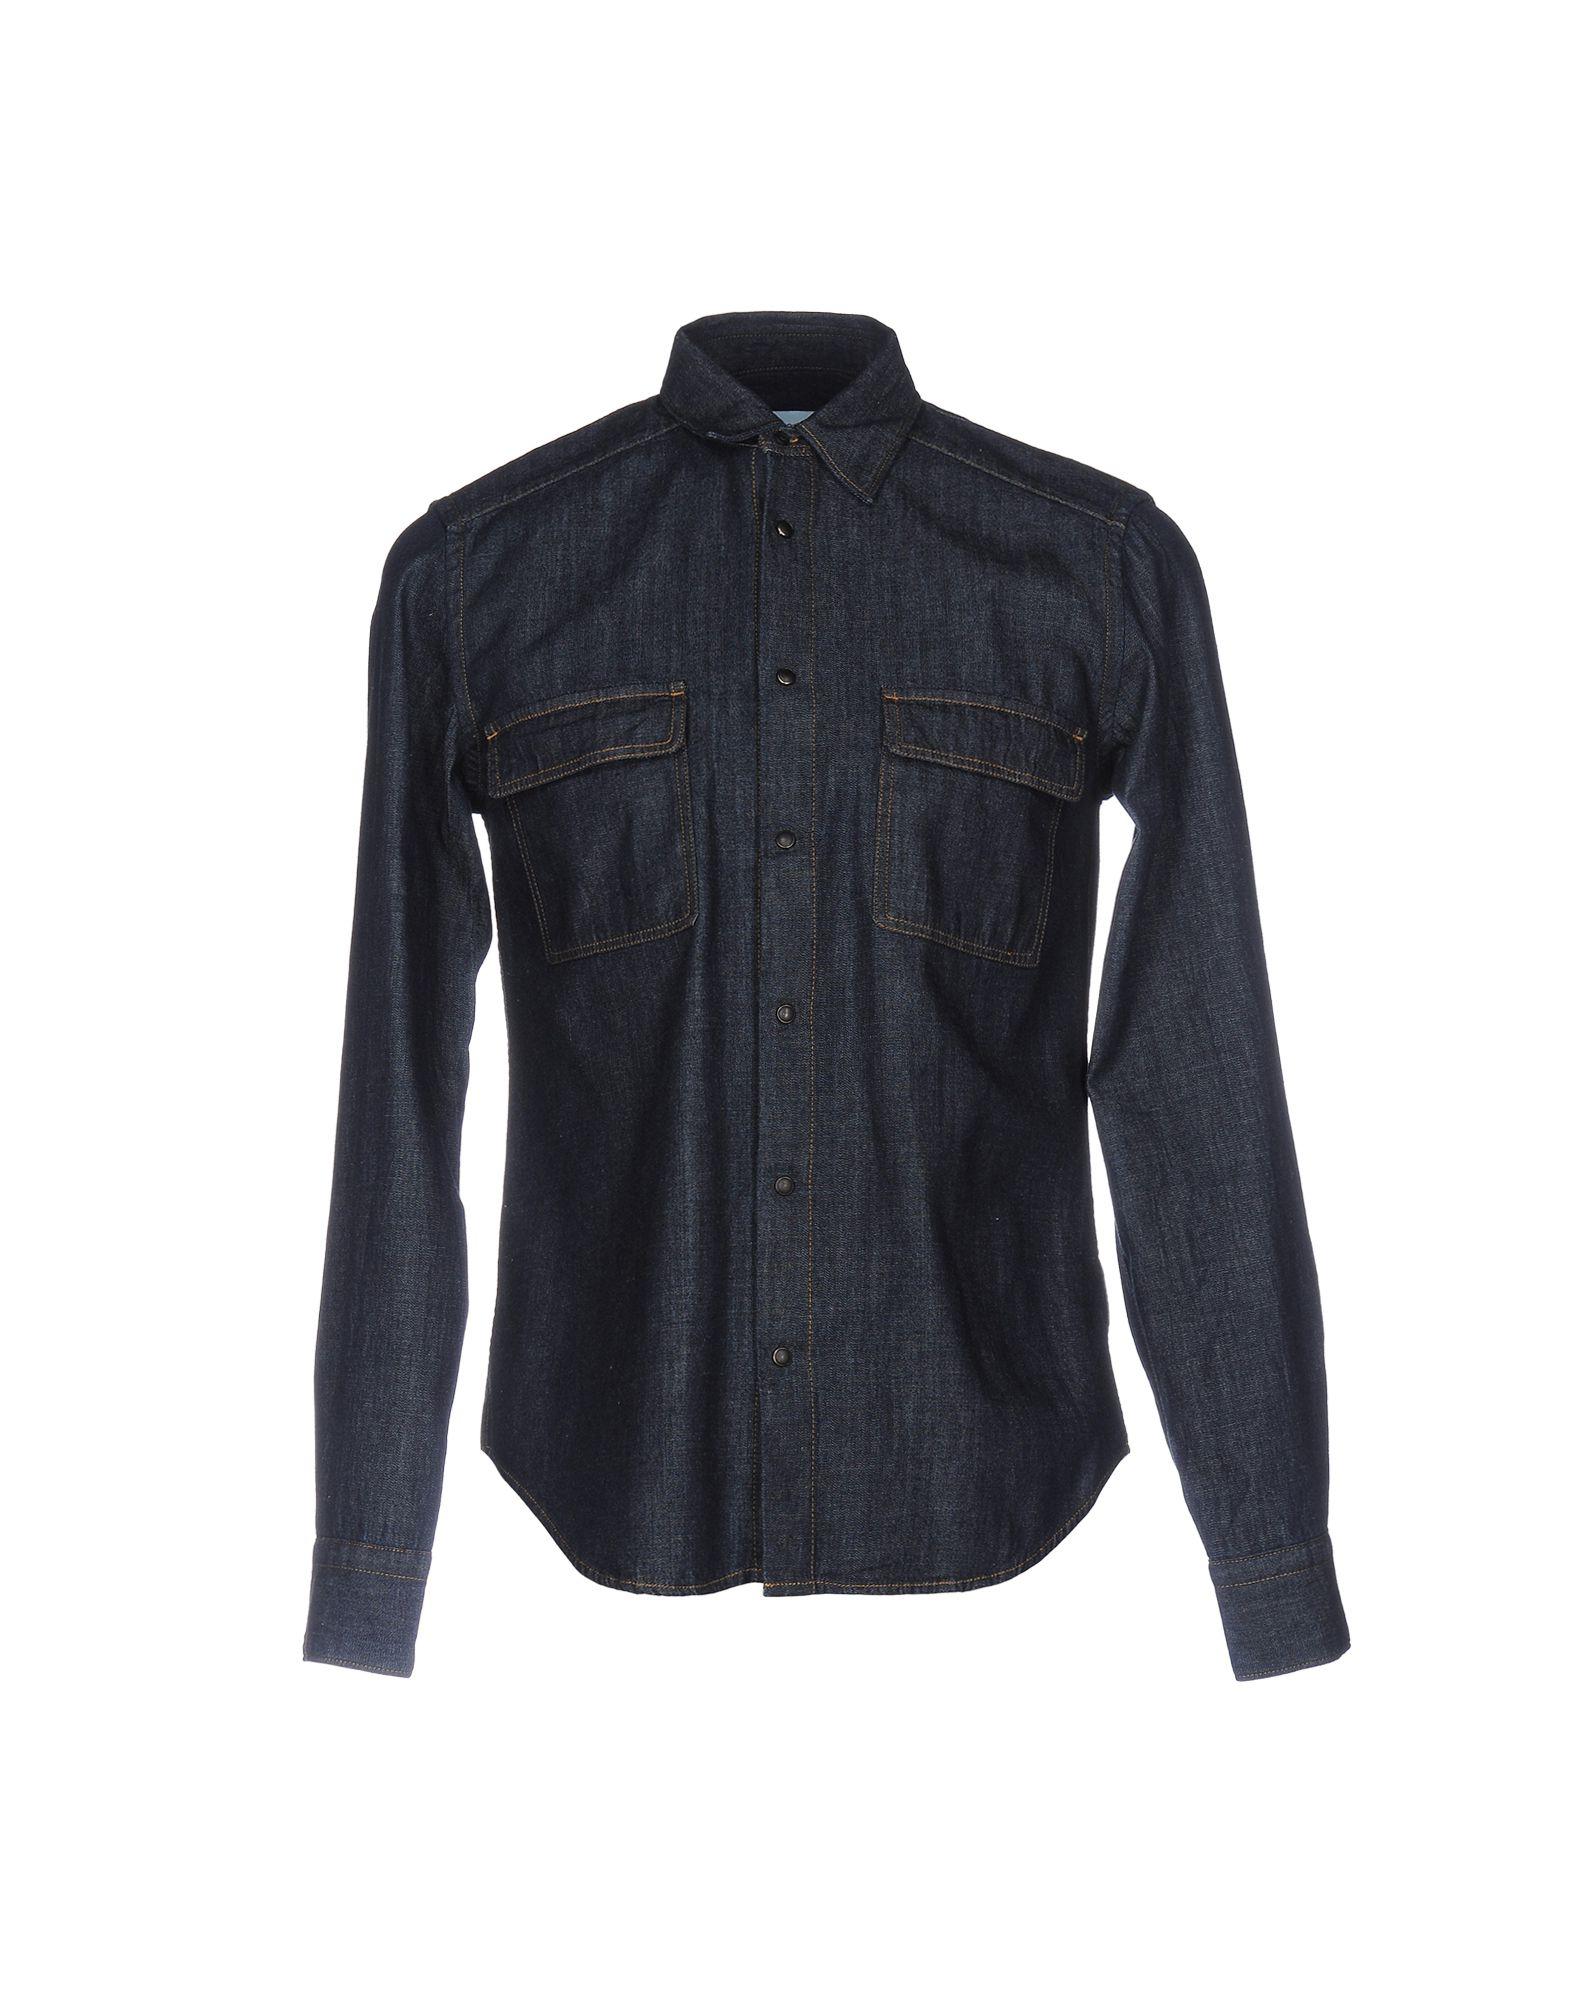 MAURO GRIFONI Джинсовая рубашка mcr джинсовая рубашка